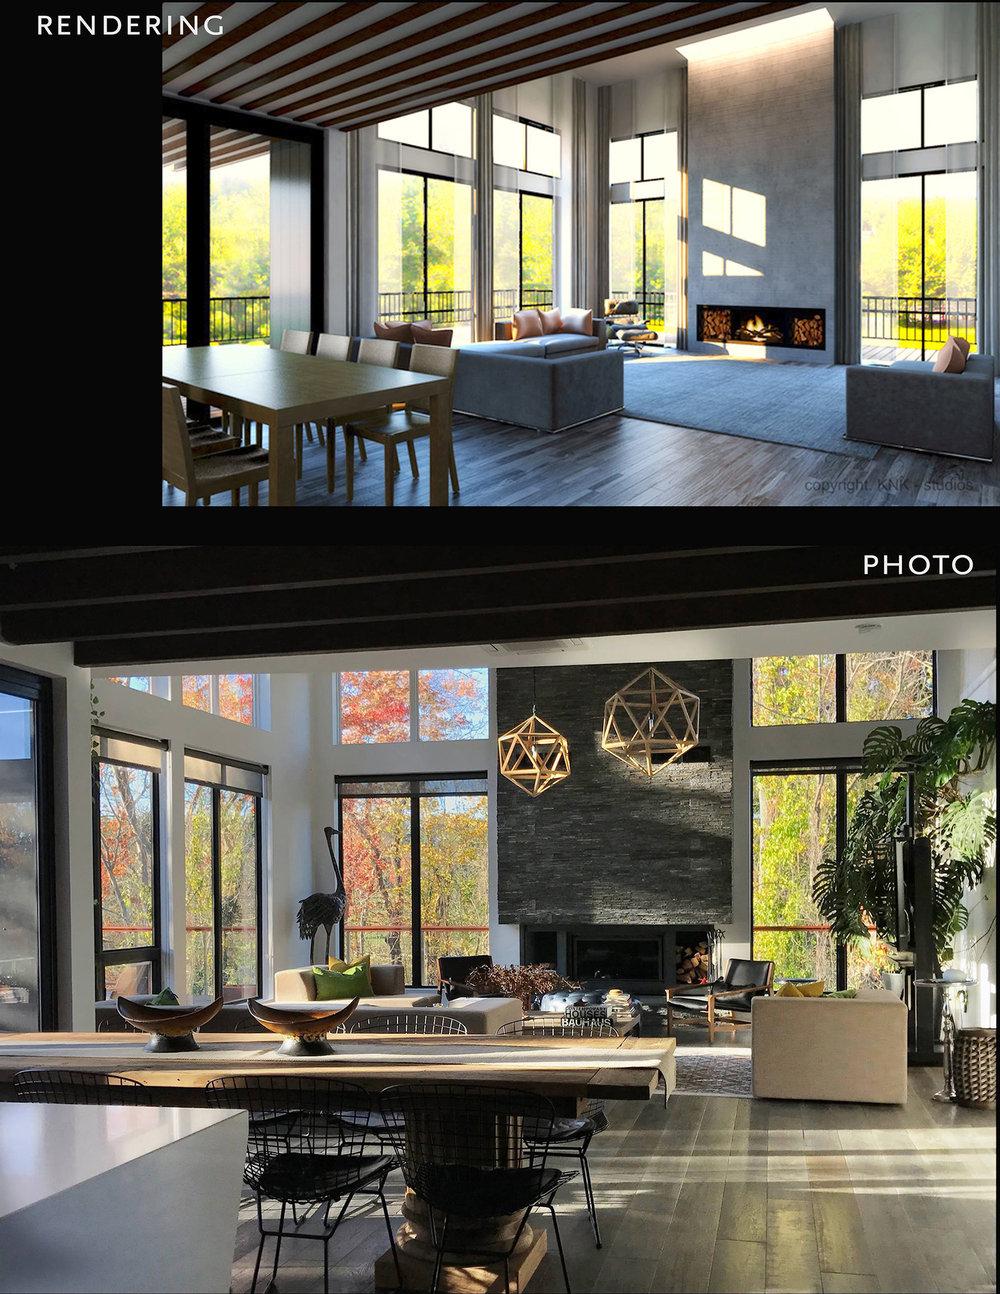 Interior_examples6.jpg